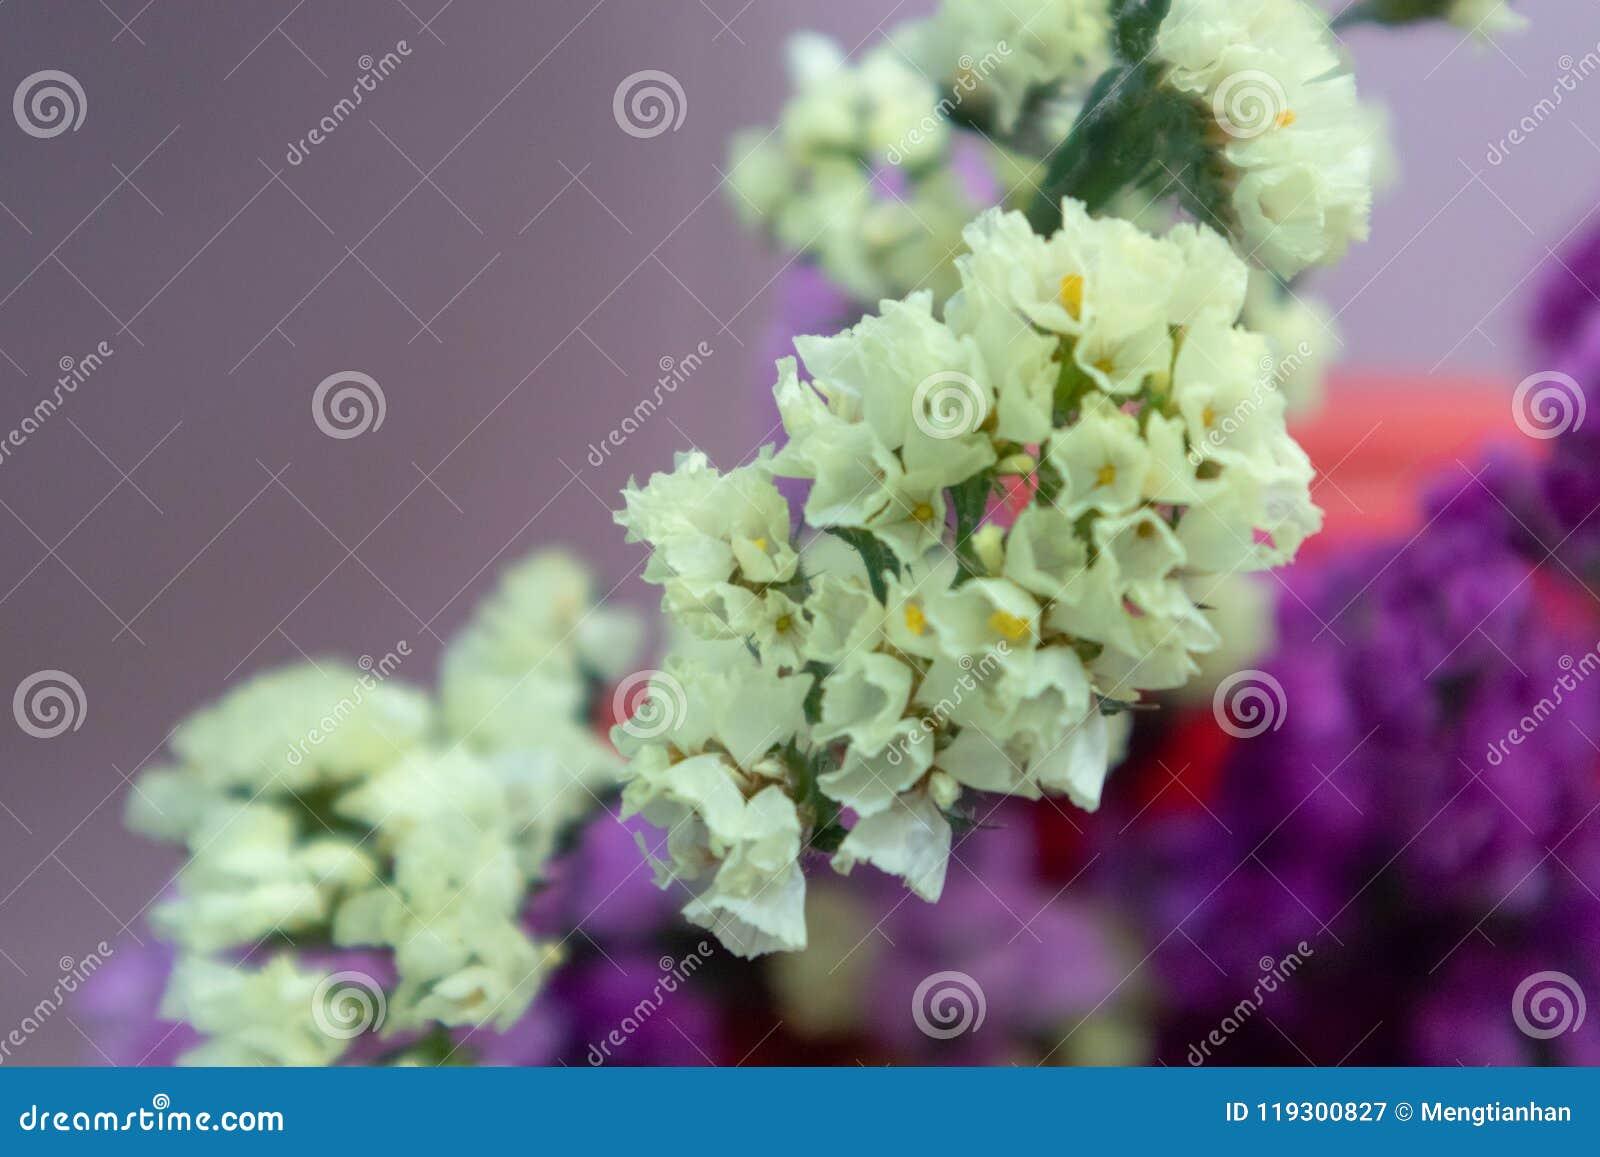 Sea lavender cut flower stock image image of lavender 119300827 download sea lavender cut flower stock image image of lavender 119300827 izmirmasajfo